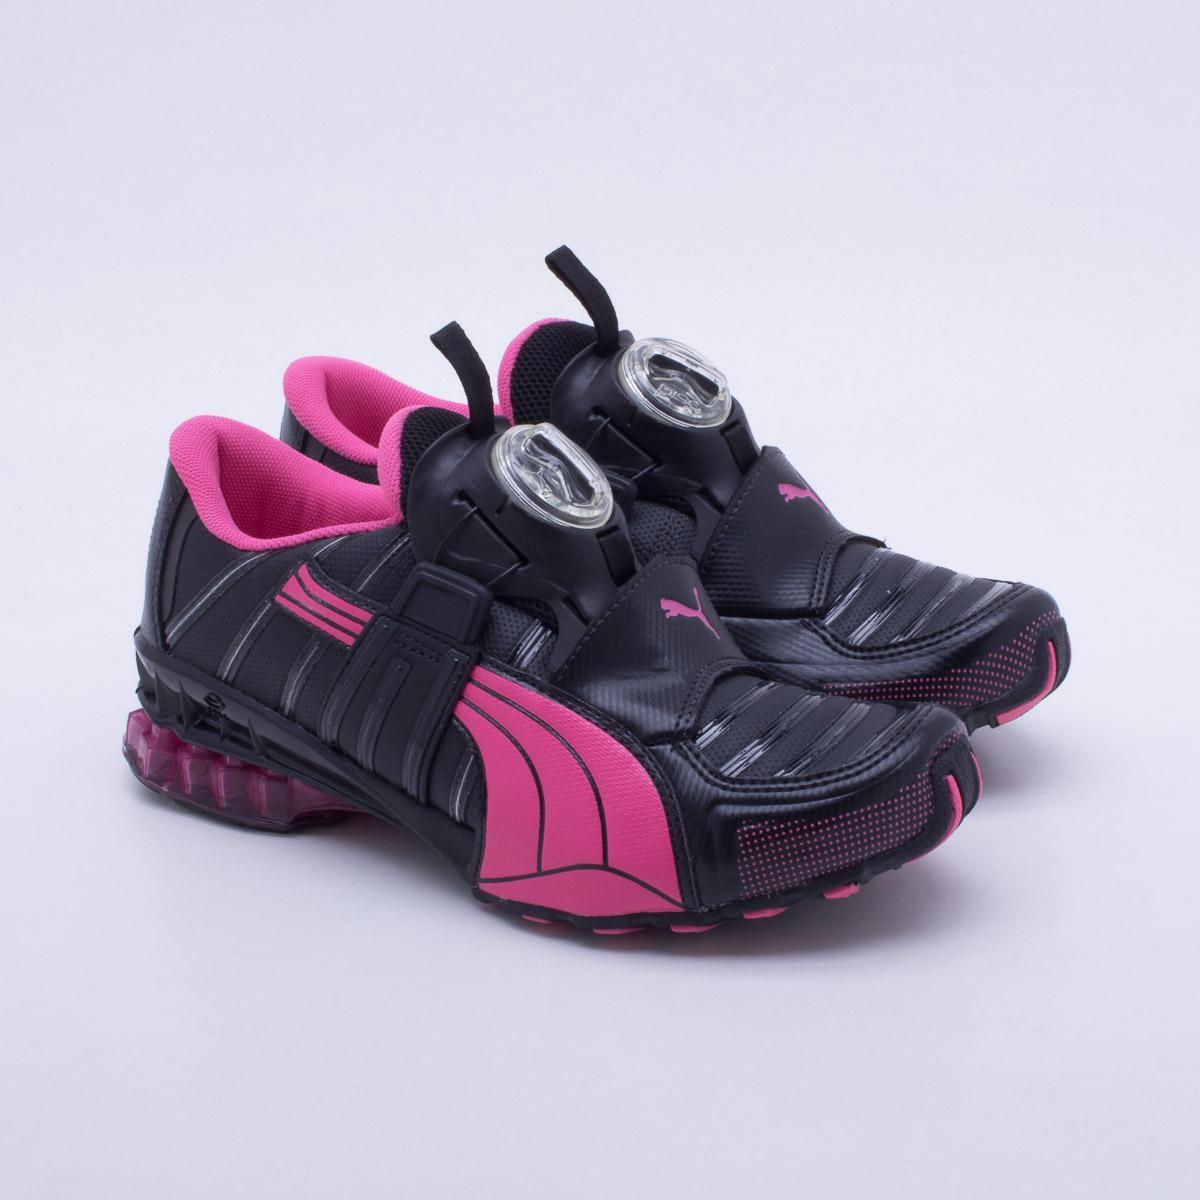 puma disc feminino preto e rosa